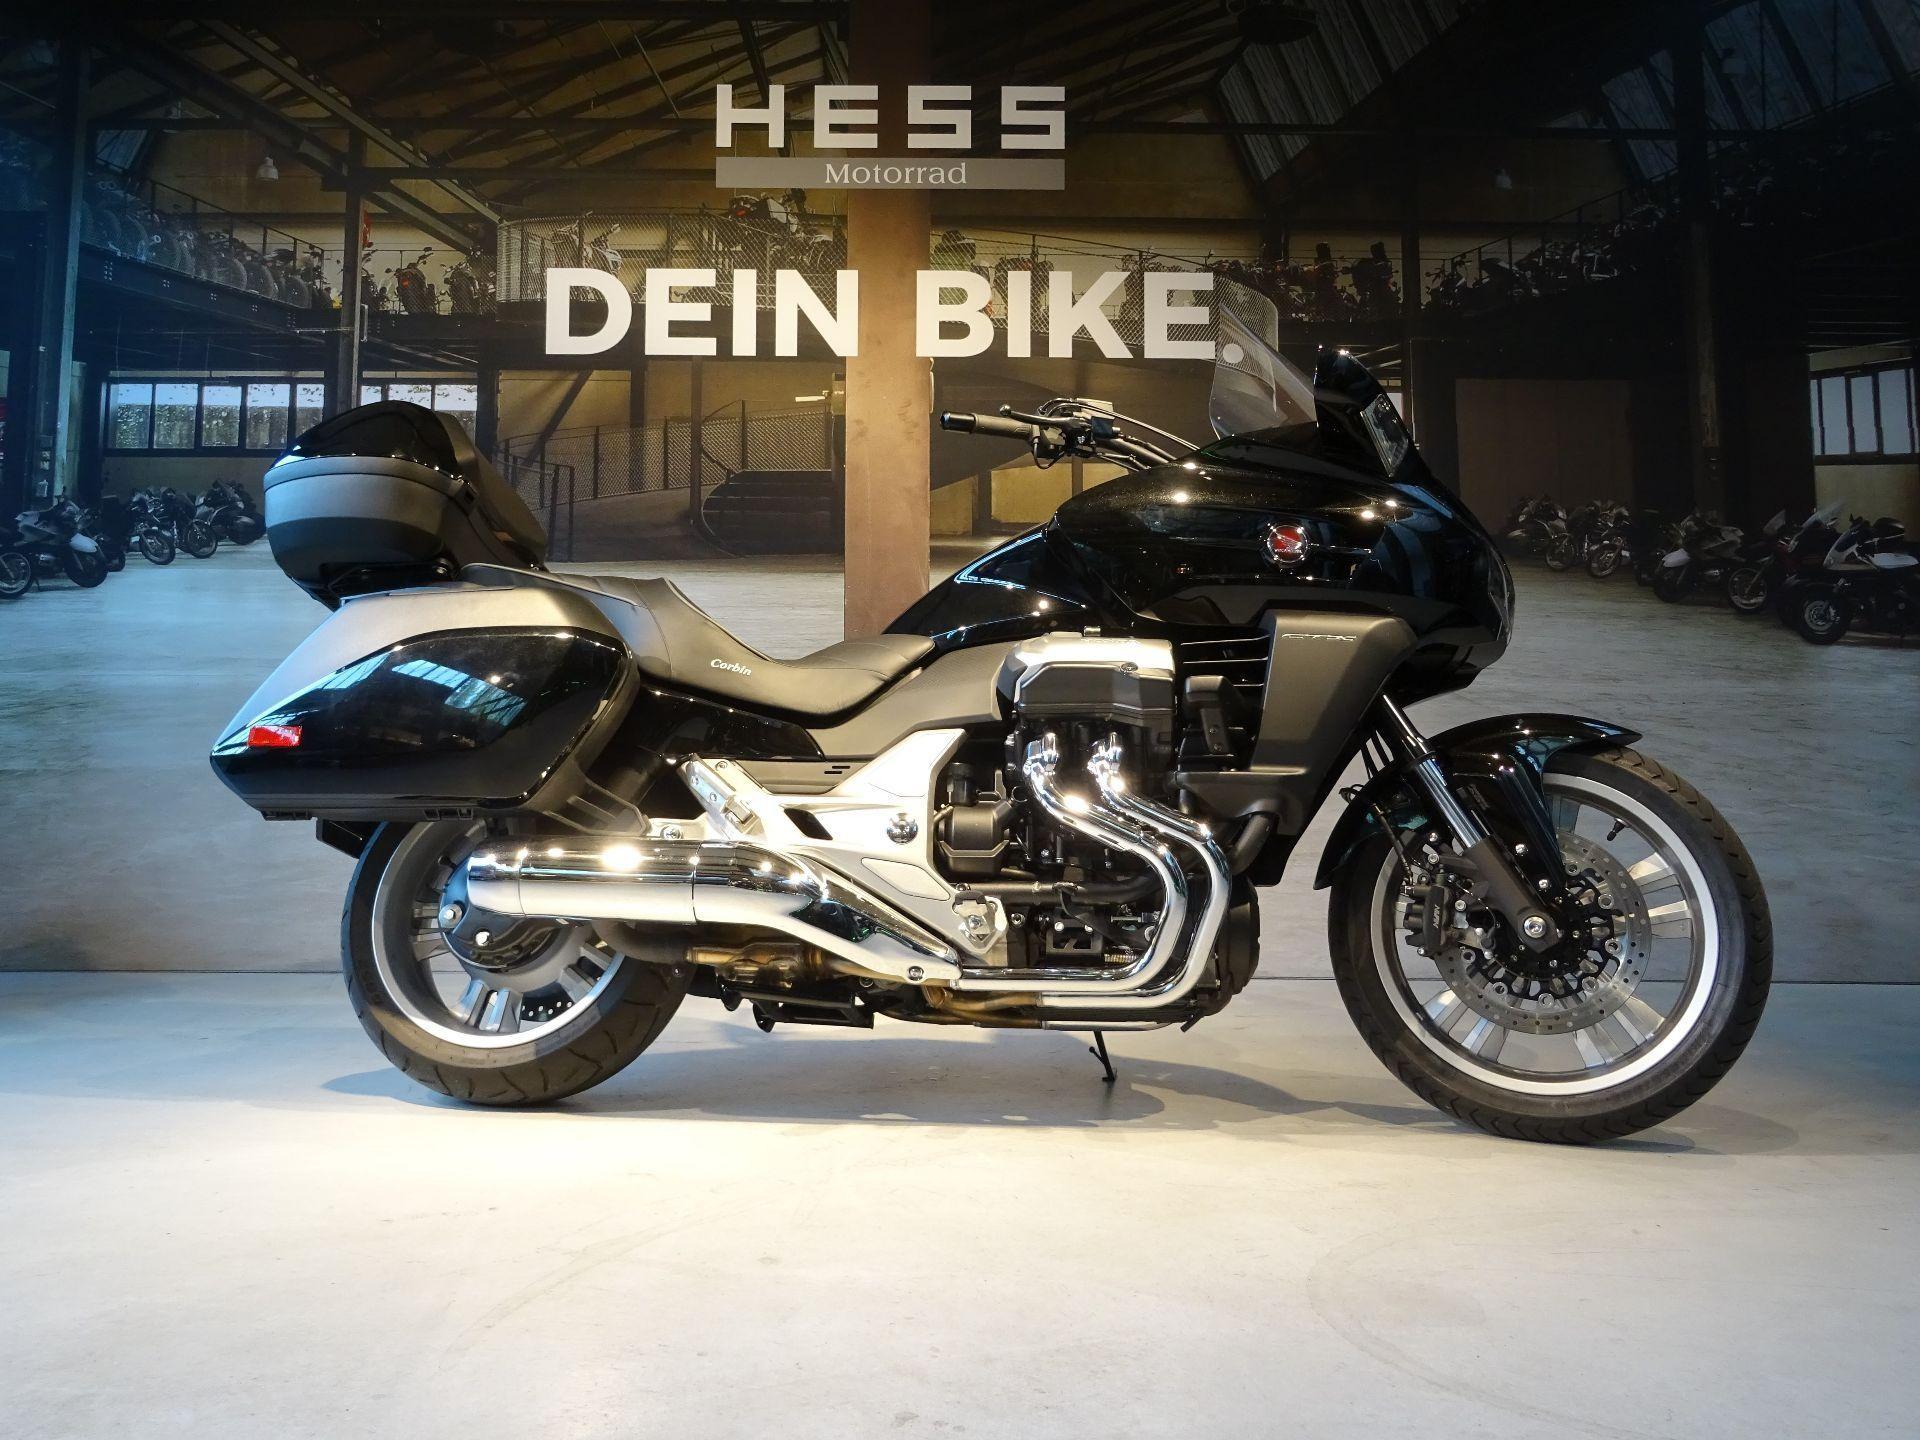 Moto Occasions acheter HONDA CTX 1300 A ABS HESS Motorrad ... Honda Occasions